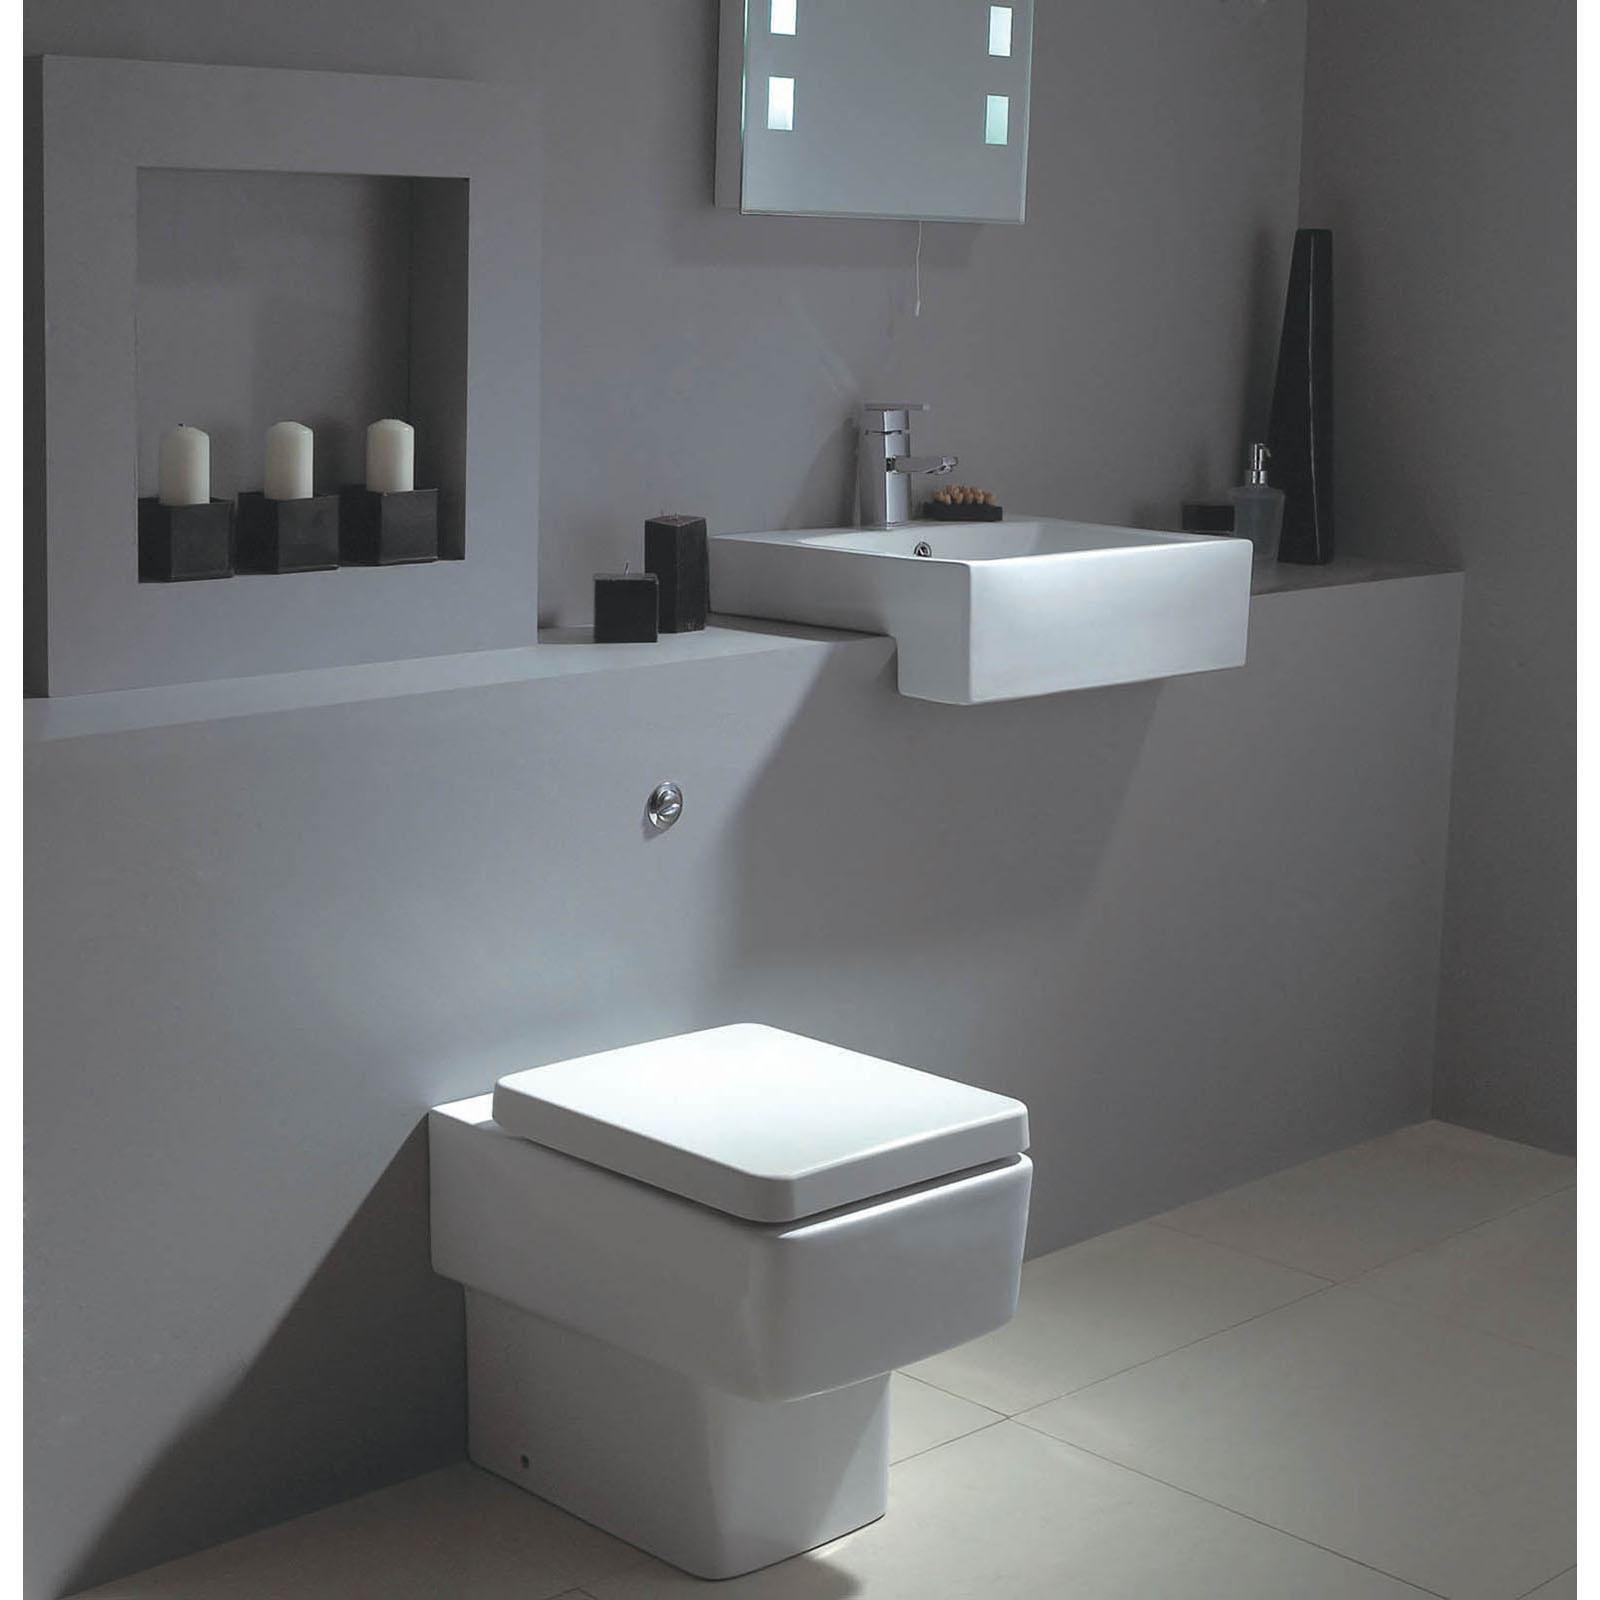 qube semi recessed basin h v bathrooms   tiles Mirrored Furniture Mirror Dresser Set